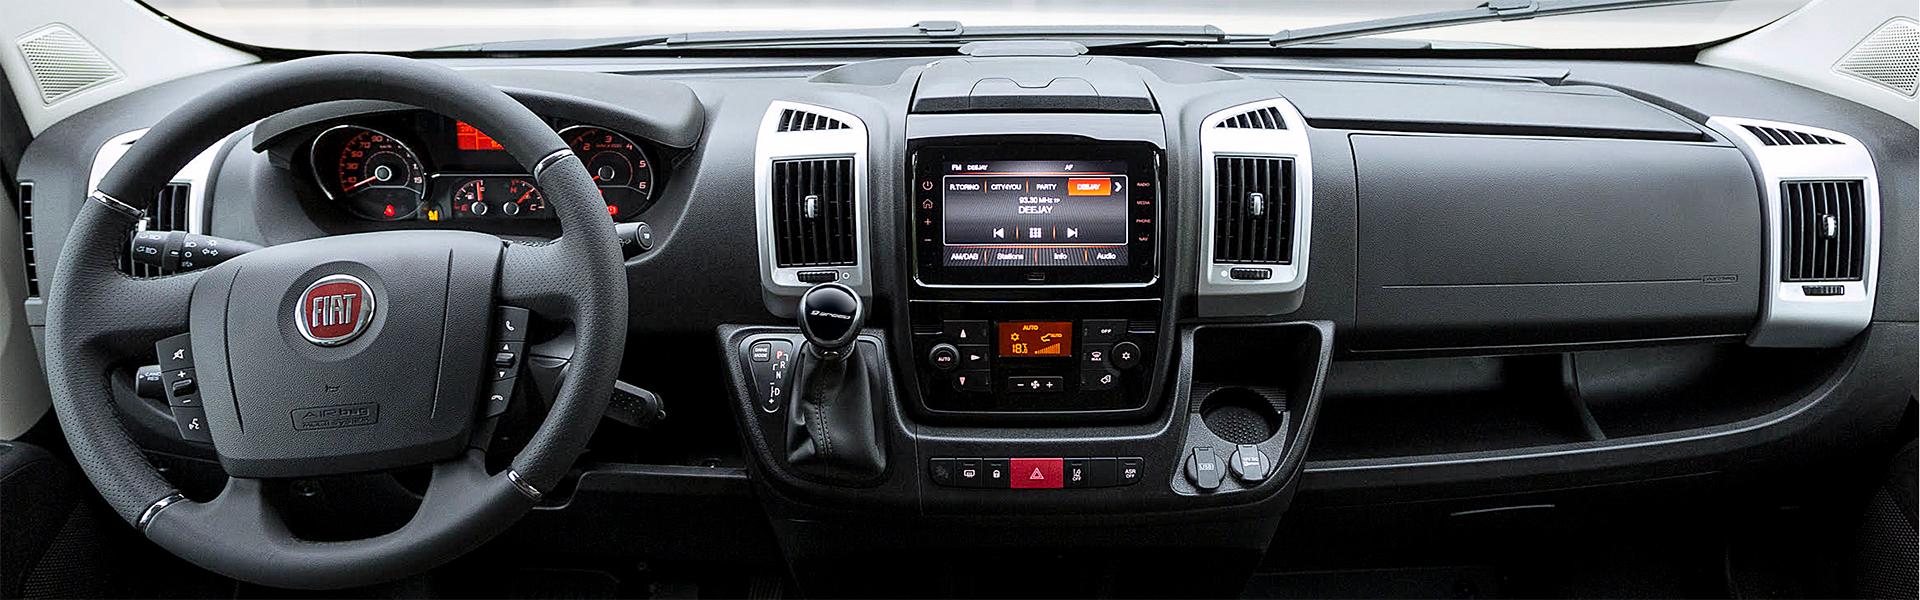 Fiat Ducato Chassis Cab ׀ Convertible Truck ׀ Fiat